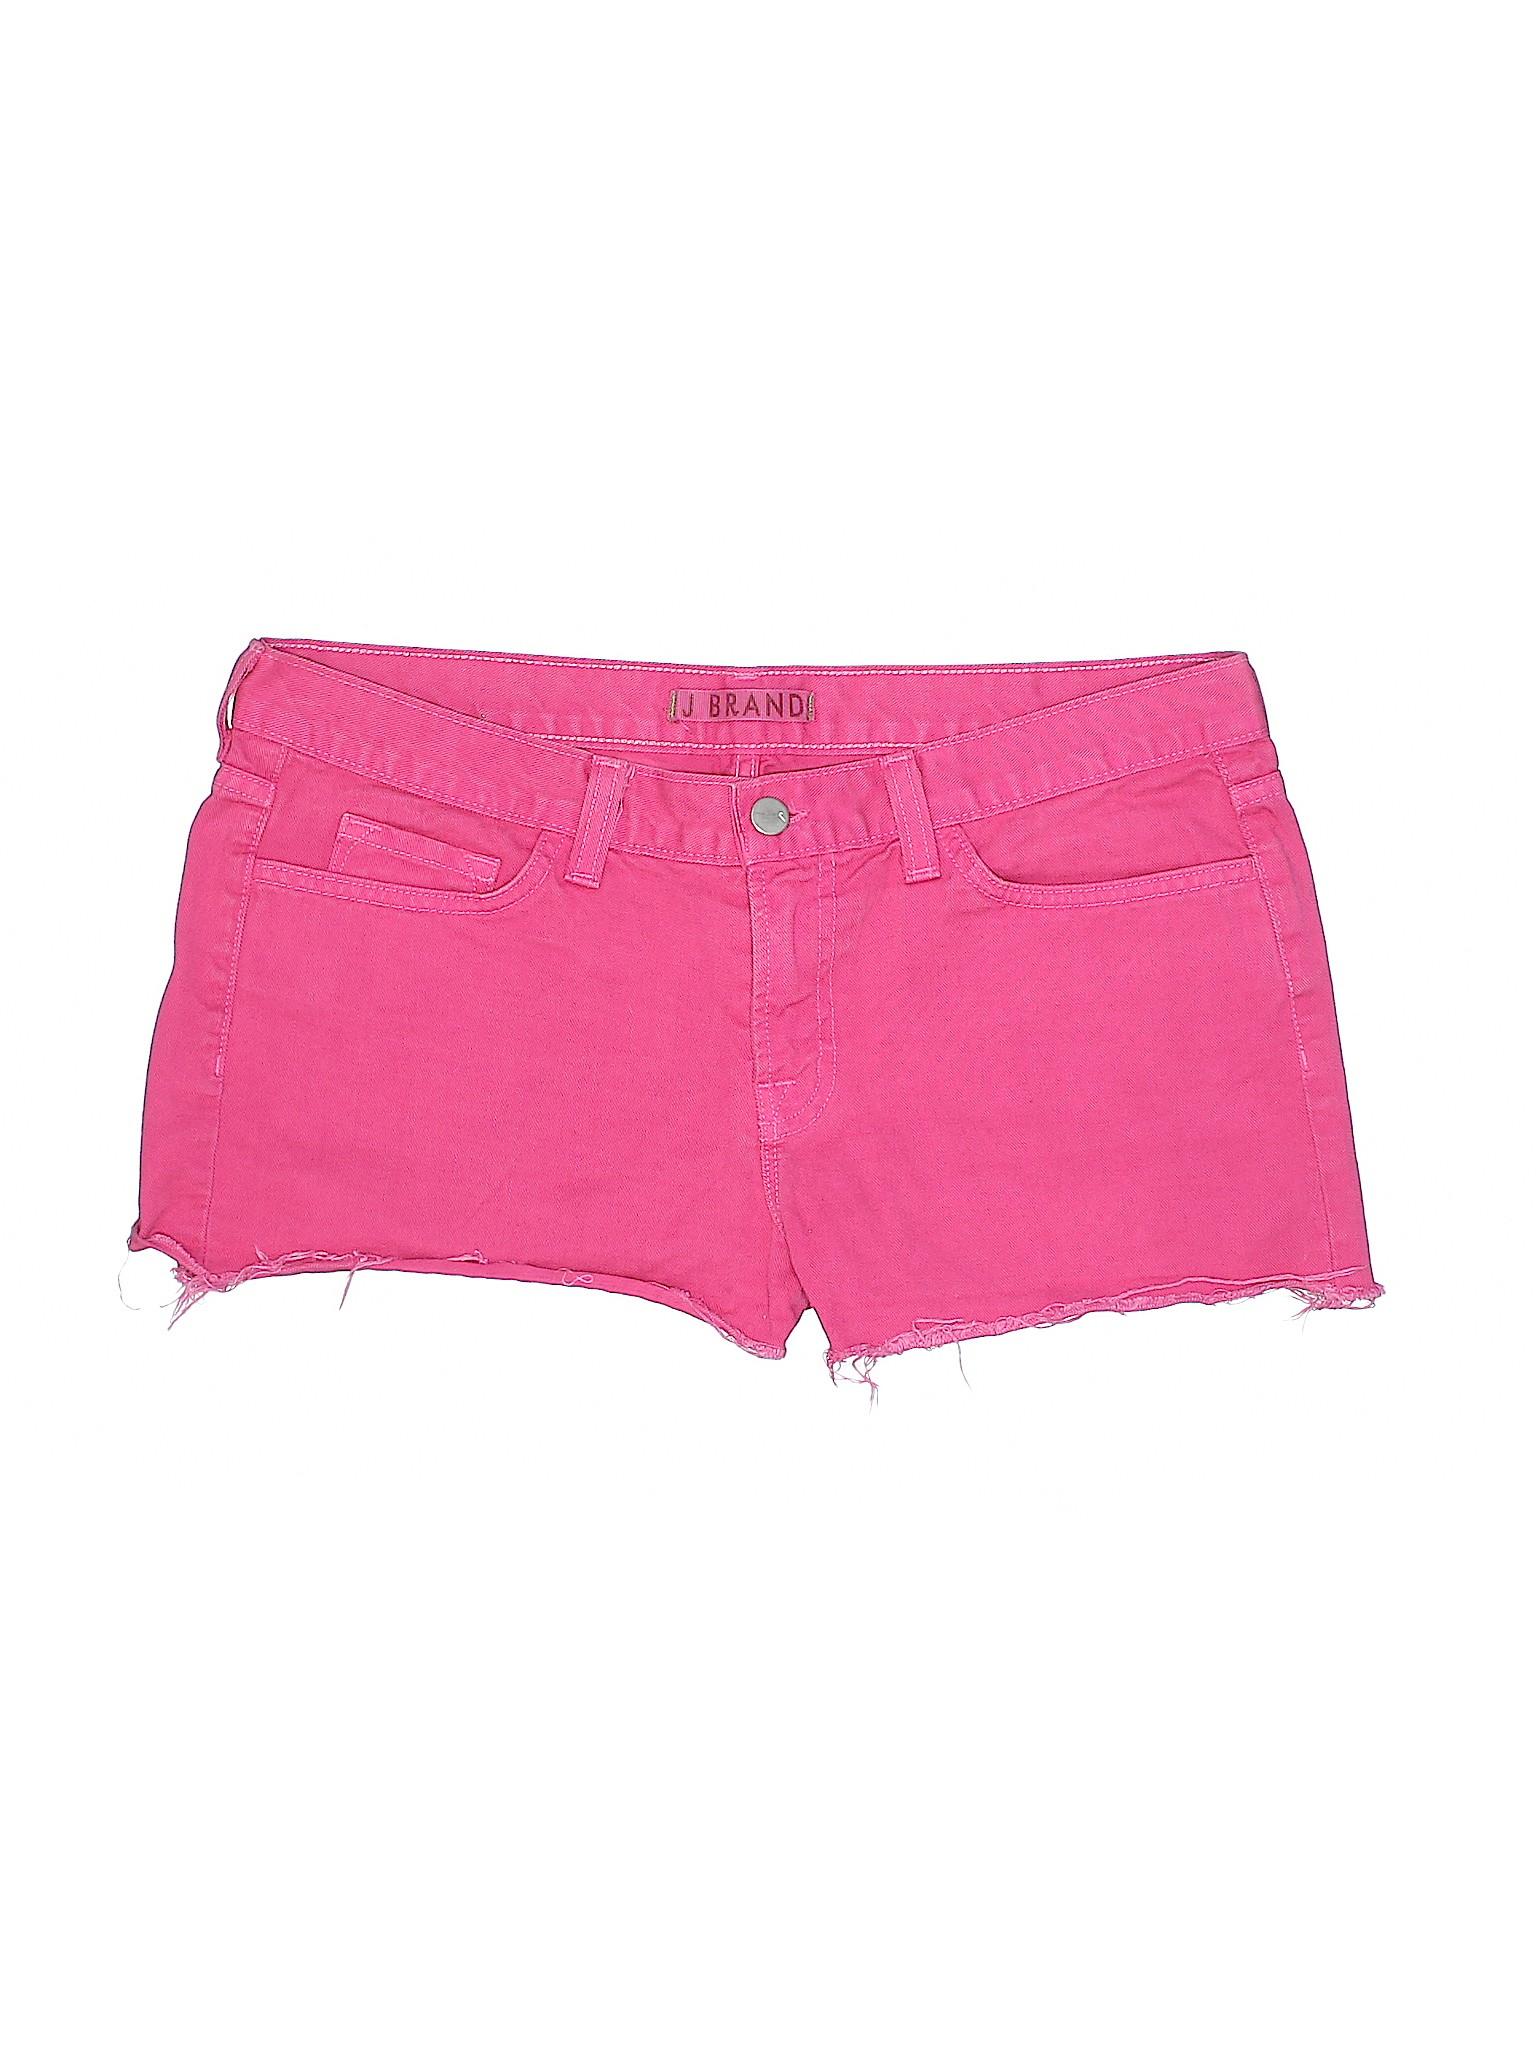 Brand Shorts Boutique Denim Boutique J Brand Denim Shorts J wf8gqY